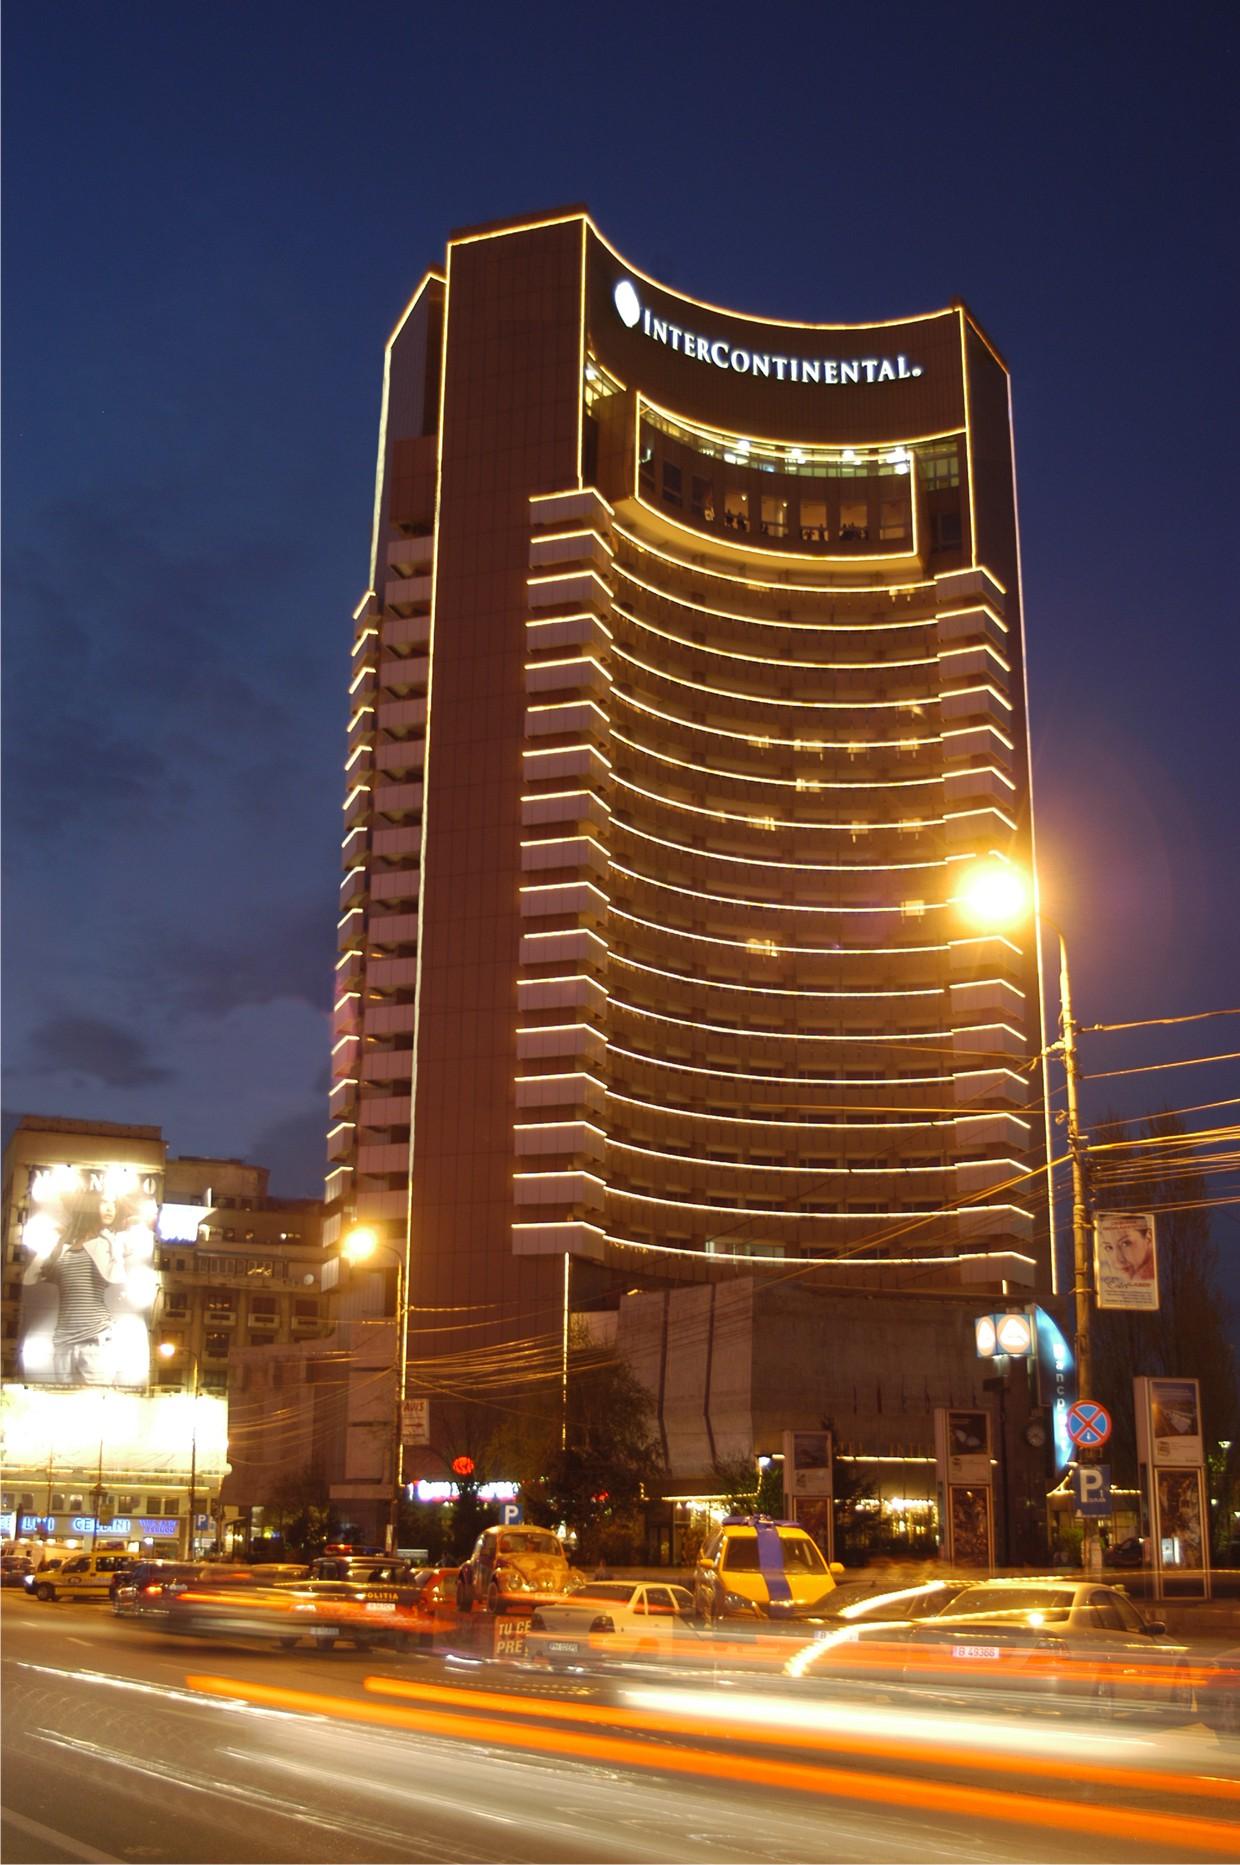 Bucharest Romania Intercontinental Hotel